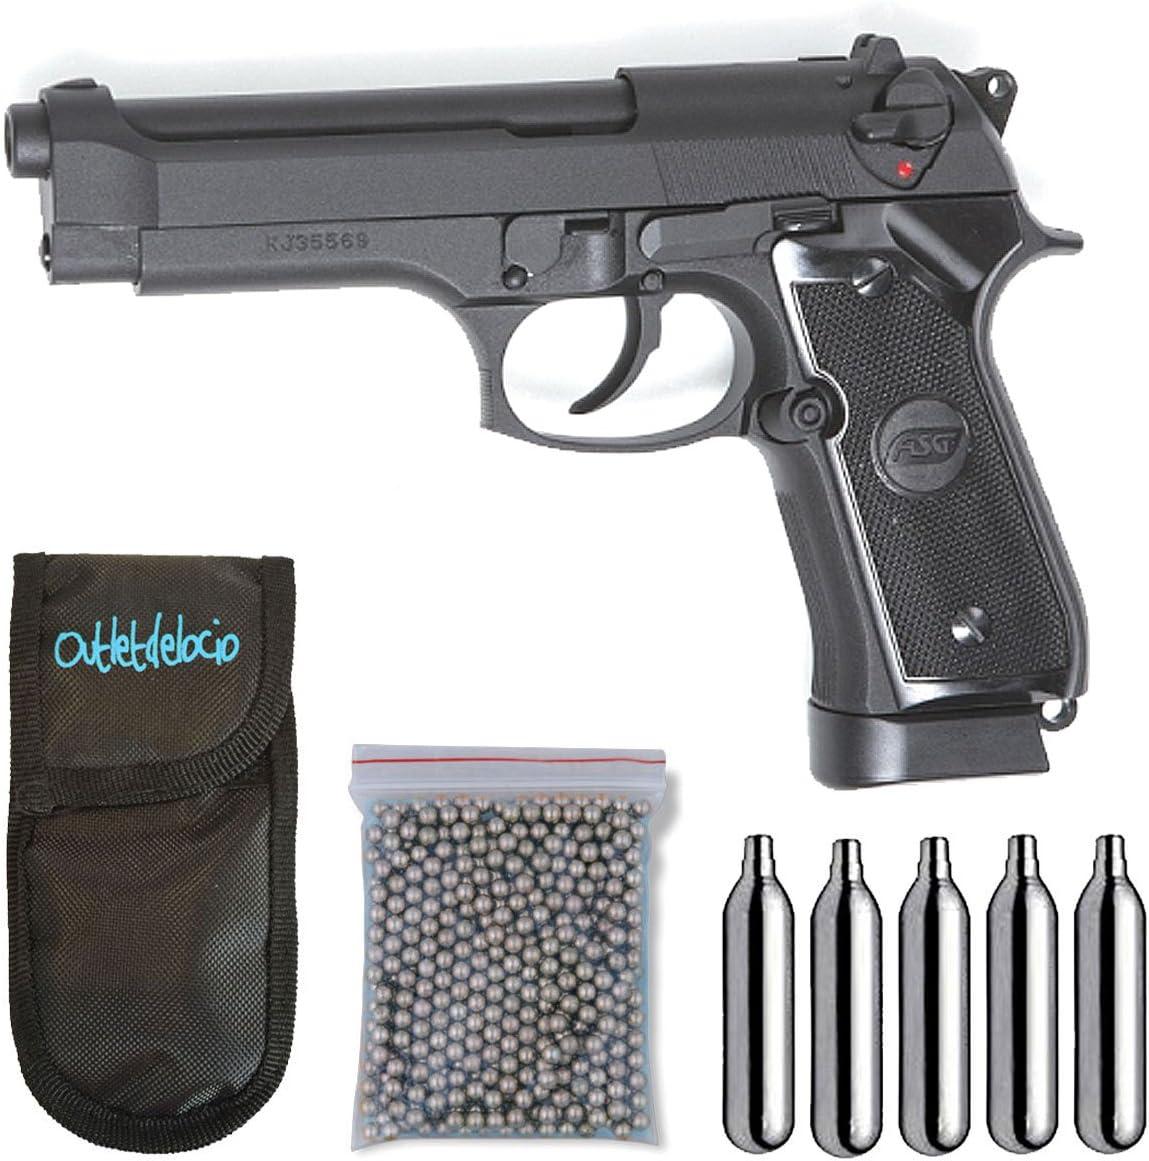 Outletdelocio. Pistola perdigon ASG18526 X9 Classic Blowback + Funda Portabombonas + Balines + Bombonas co2. 23054/29318/13275